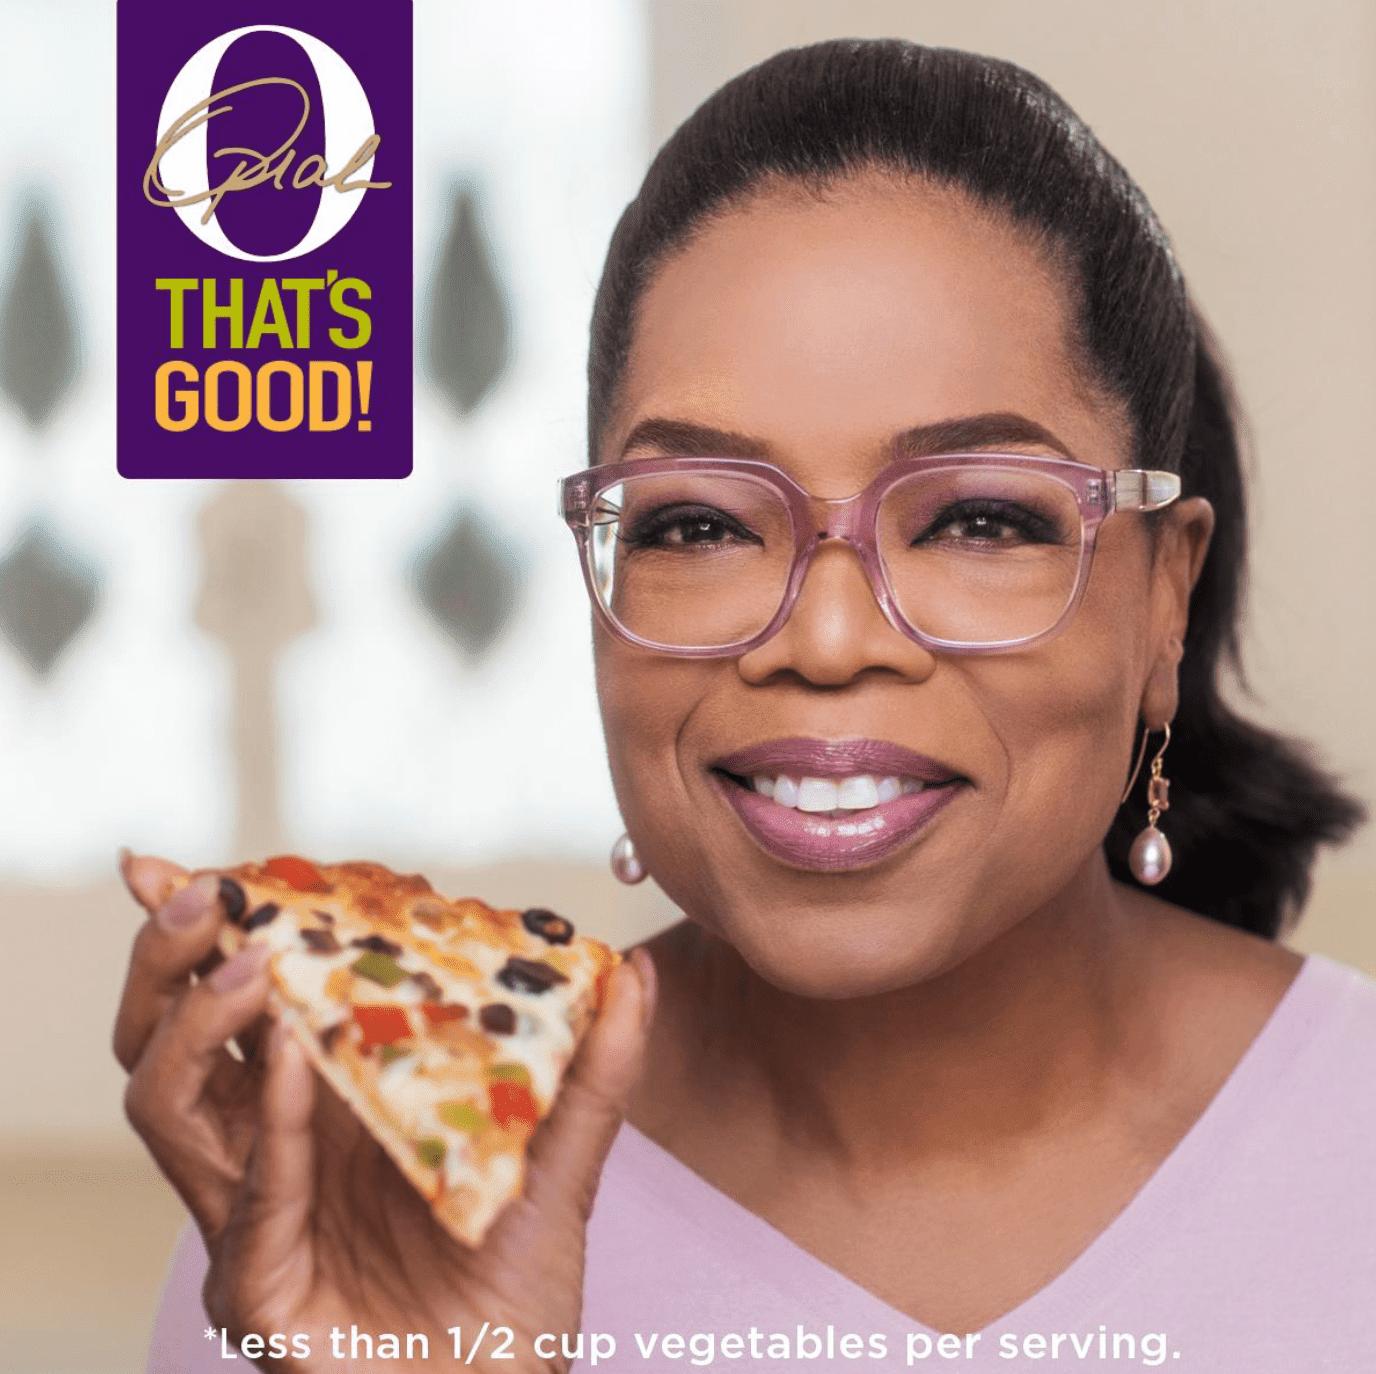 Oprah enjoy's O, That's Good frozen pizza | Facebook